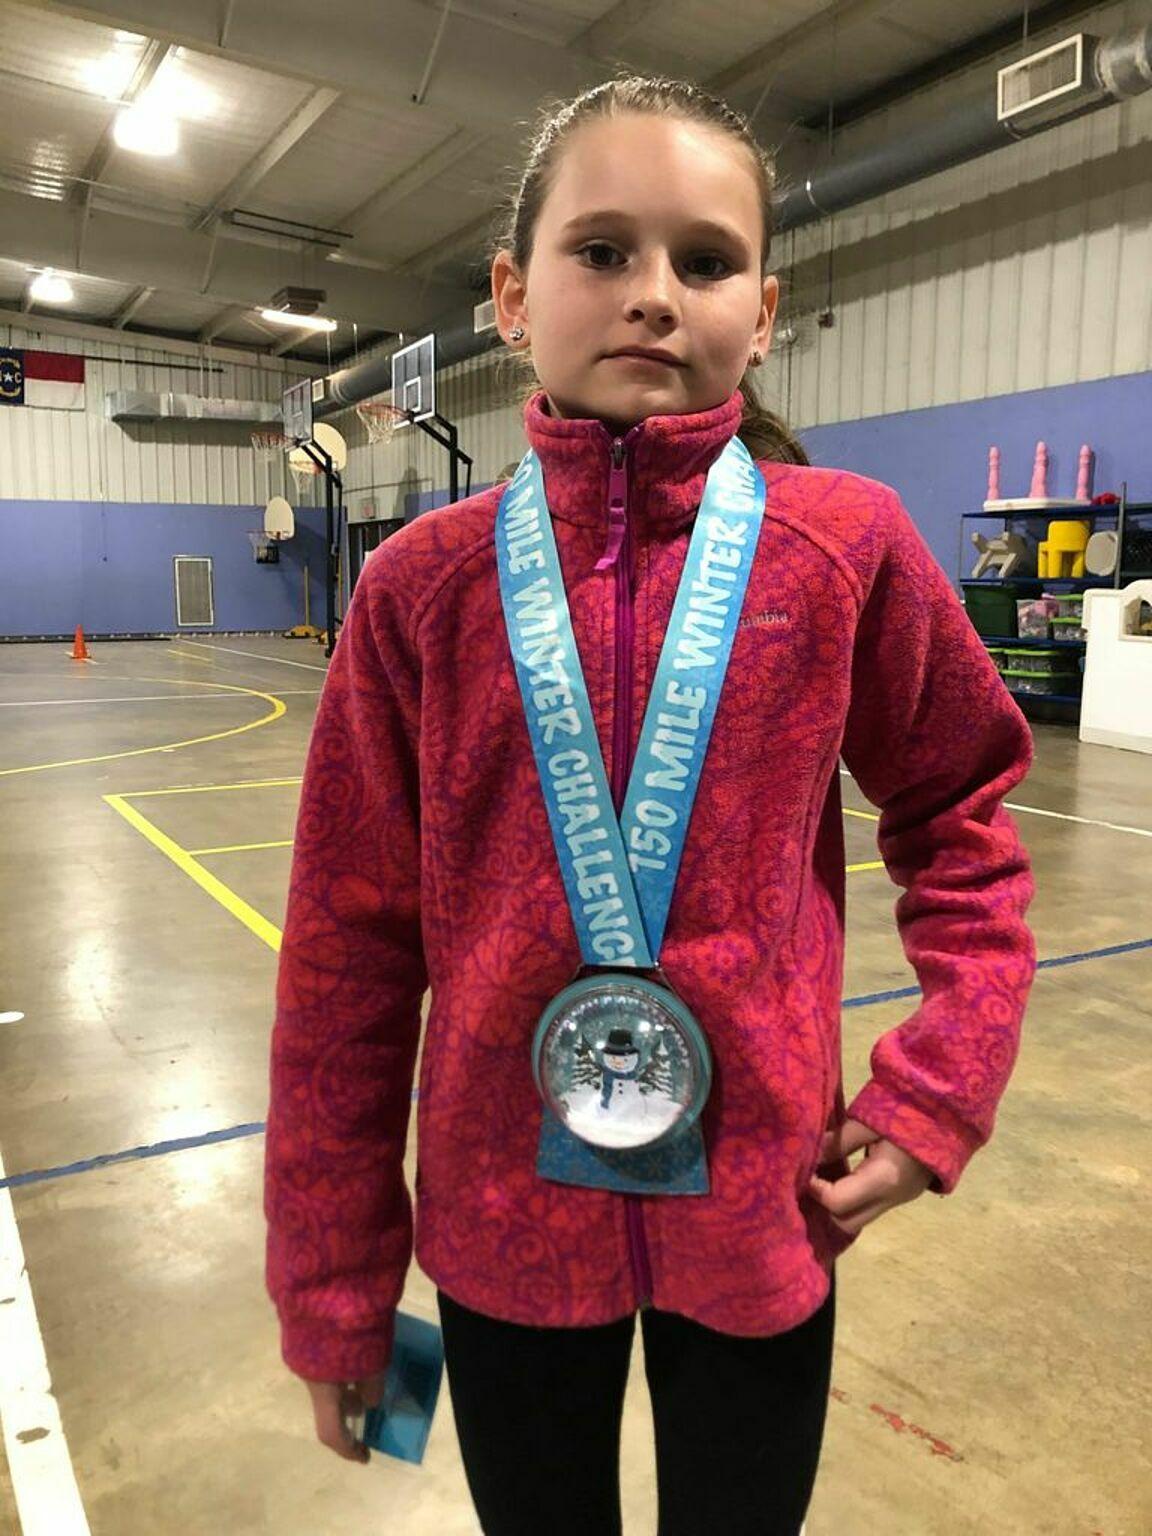 Hailey Walker giữ kỷ lục của cuộc đua Marathon Kids 2019-2020.